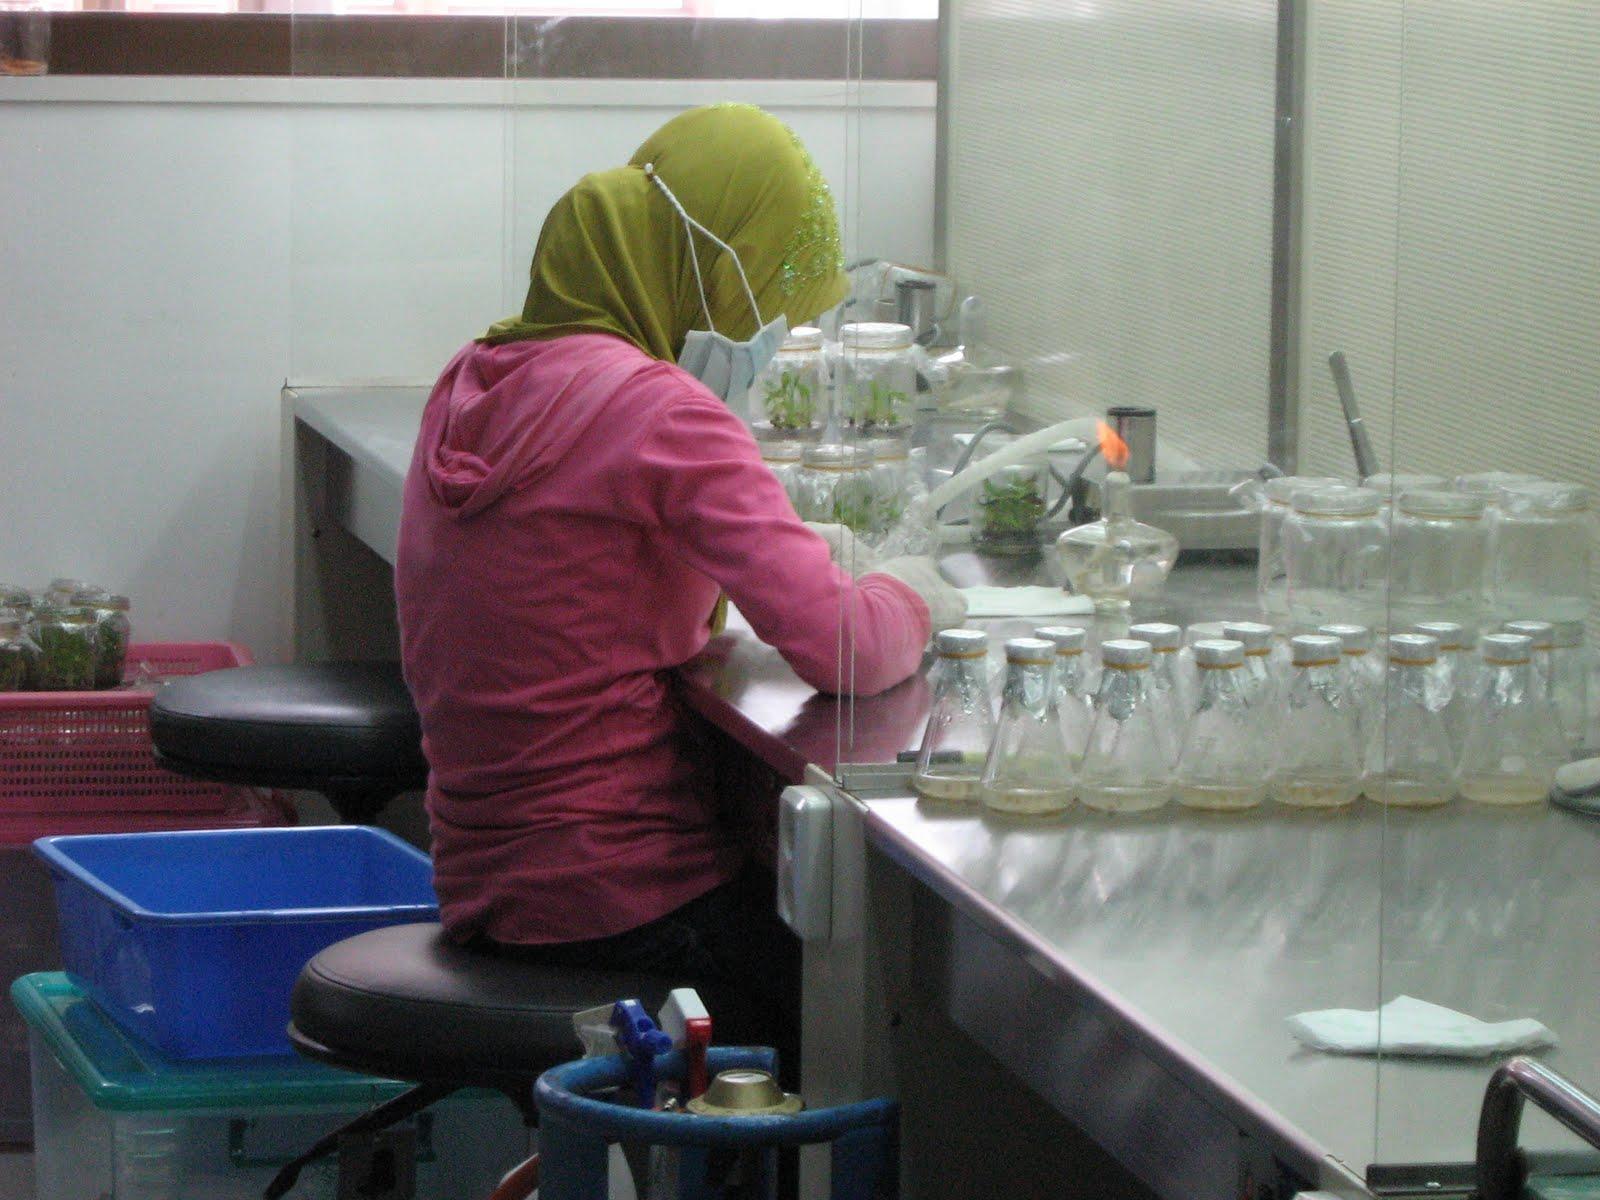 plasma nutfah konservasi tumbuhan langka dan Koleksi plasma nutfah diperlukan untuk memudahkan pengujian  tidak kurang  dari 28 ribu jenis tumbuhan, 350 ribu jenis binatang, dan 10.